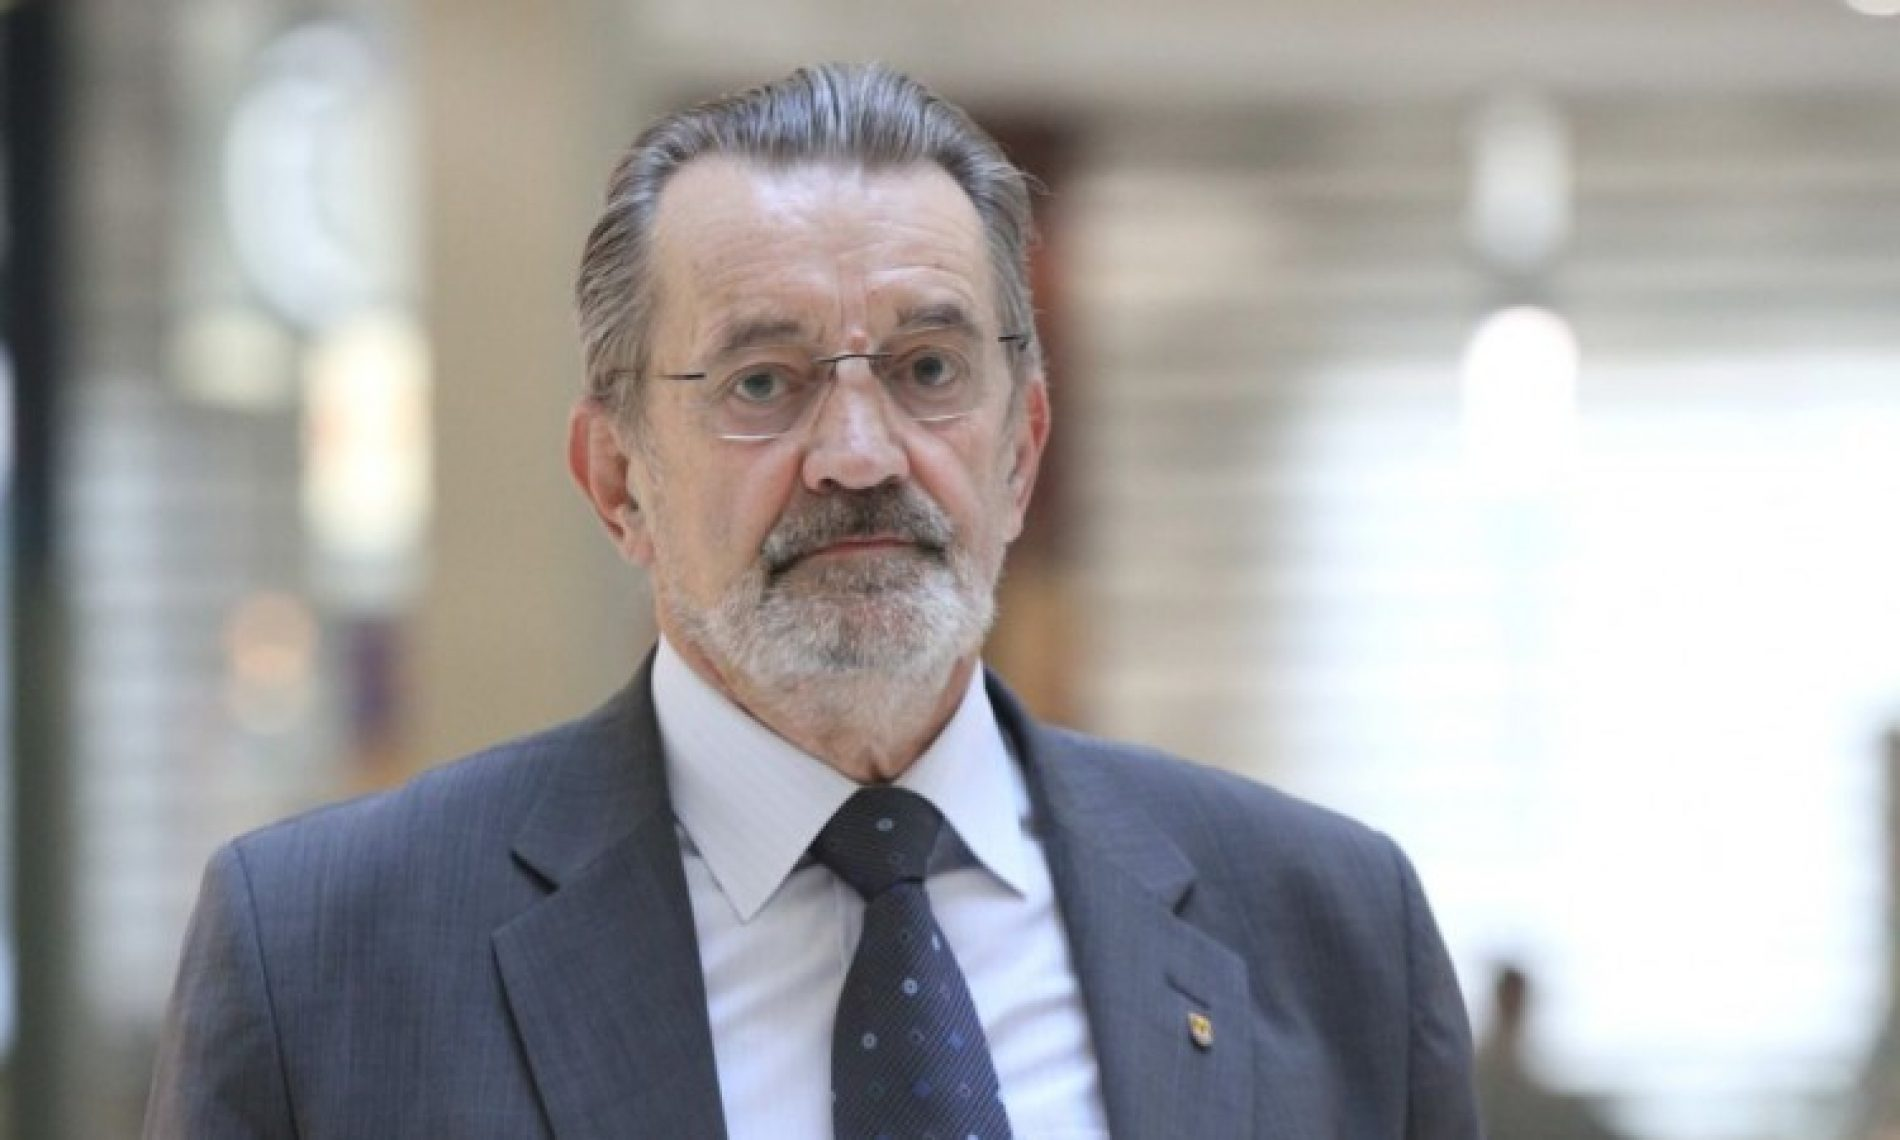 Dr. Nakaš: Bosna i Hercegovina je ozbiljno pristupila suočavanju s krizom